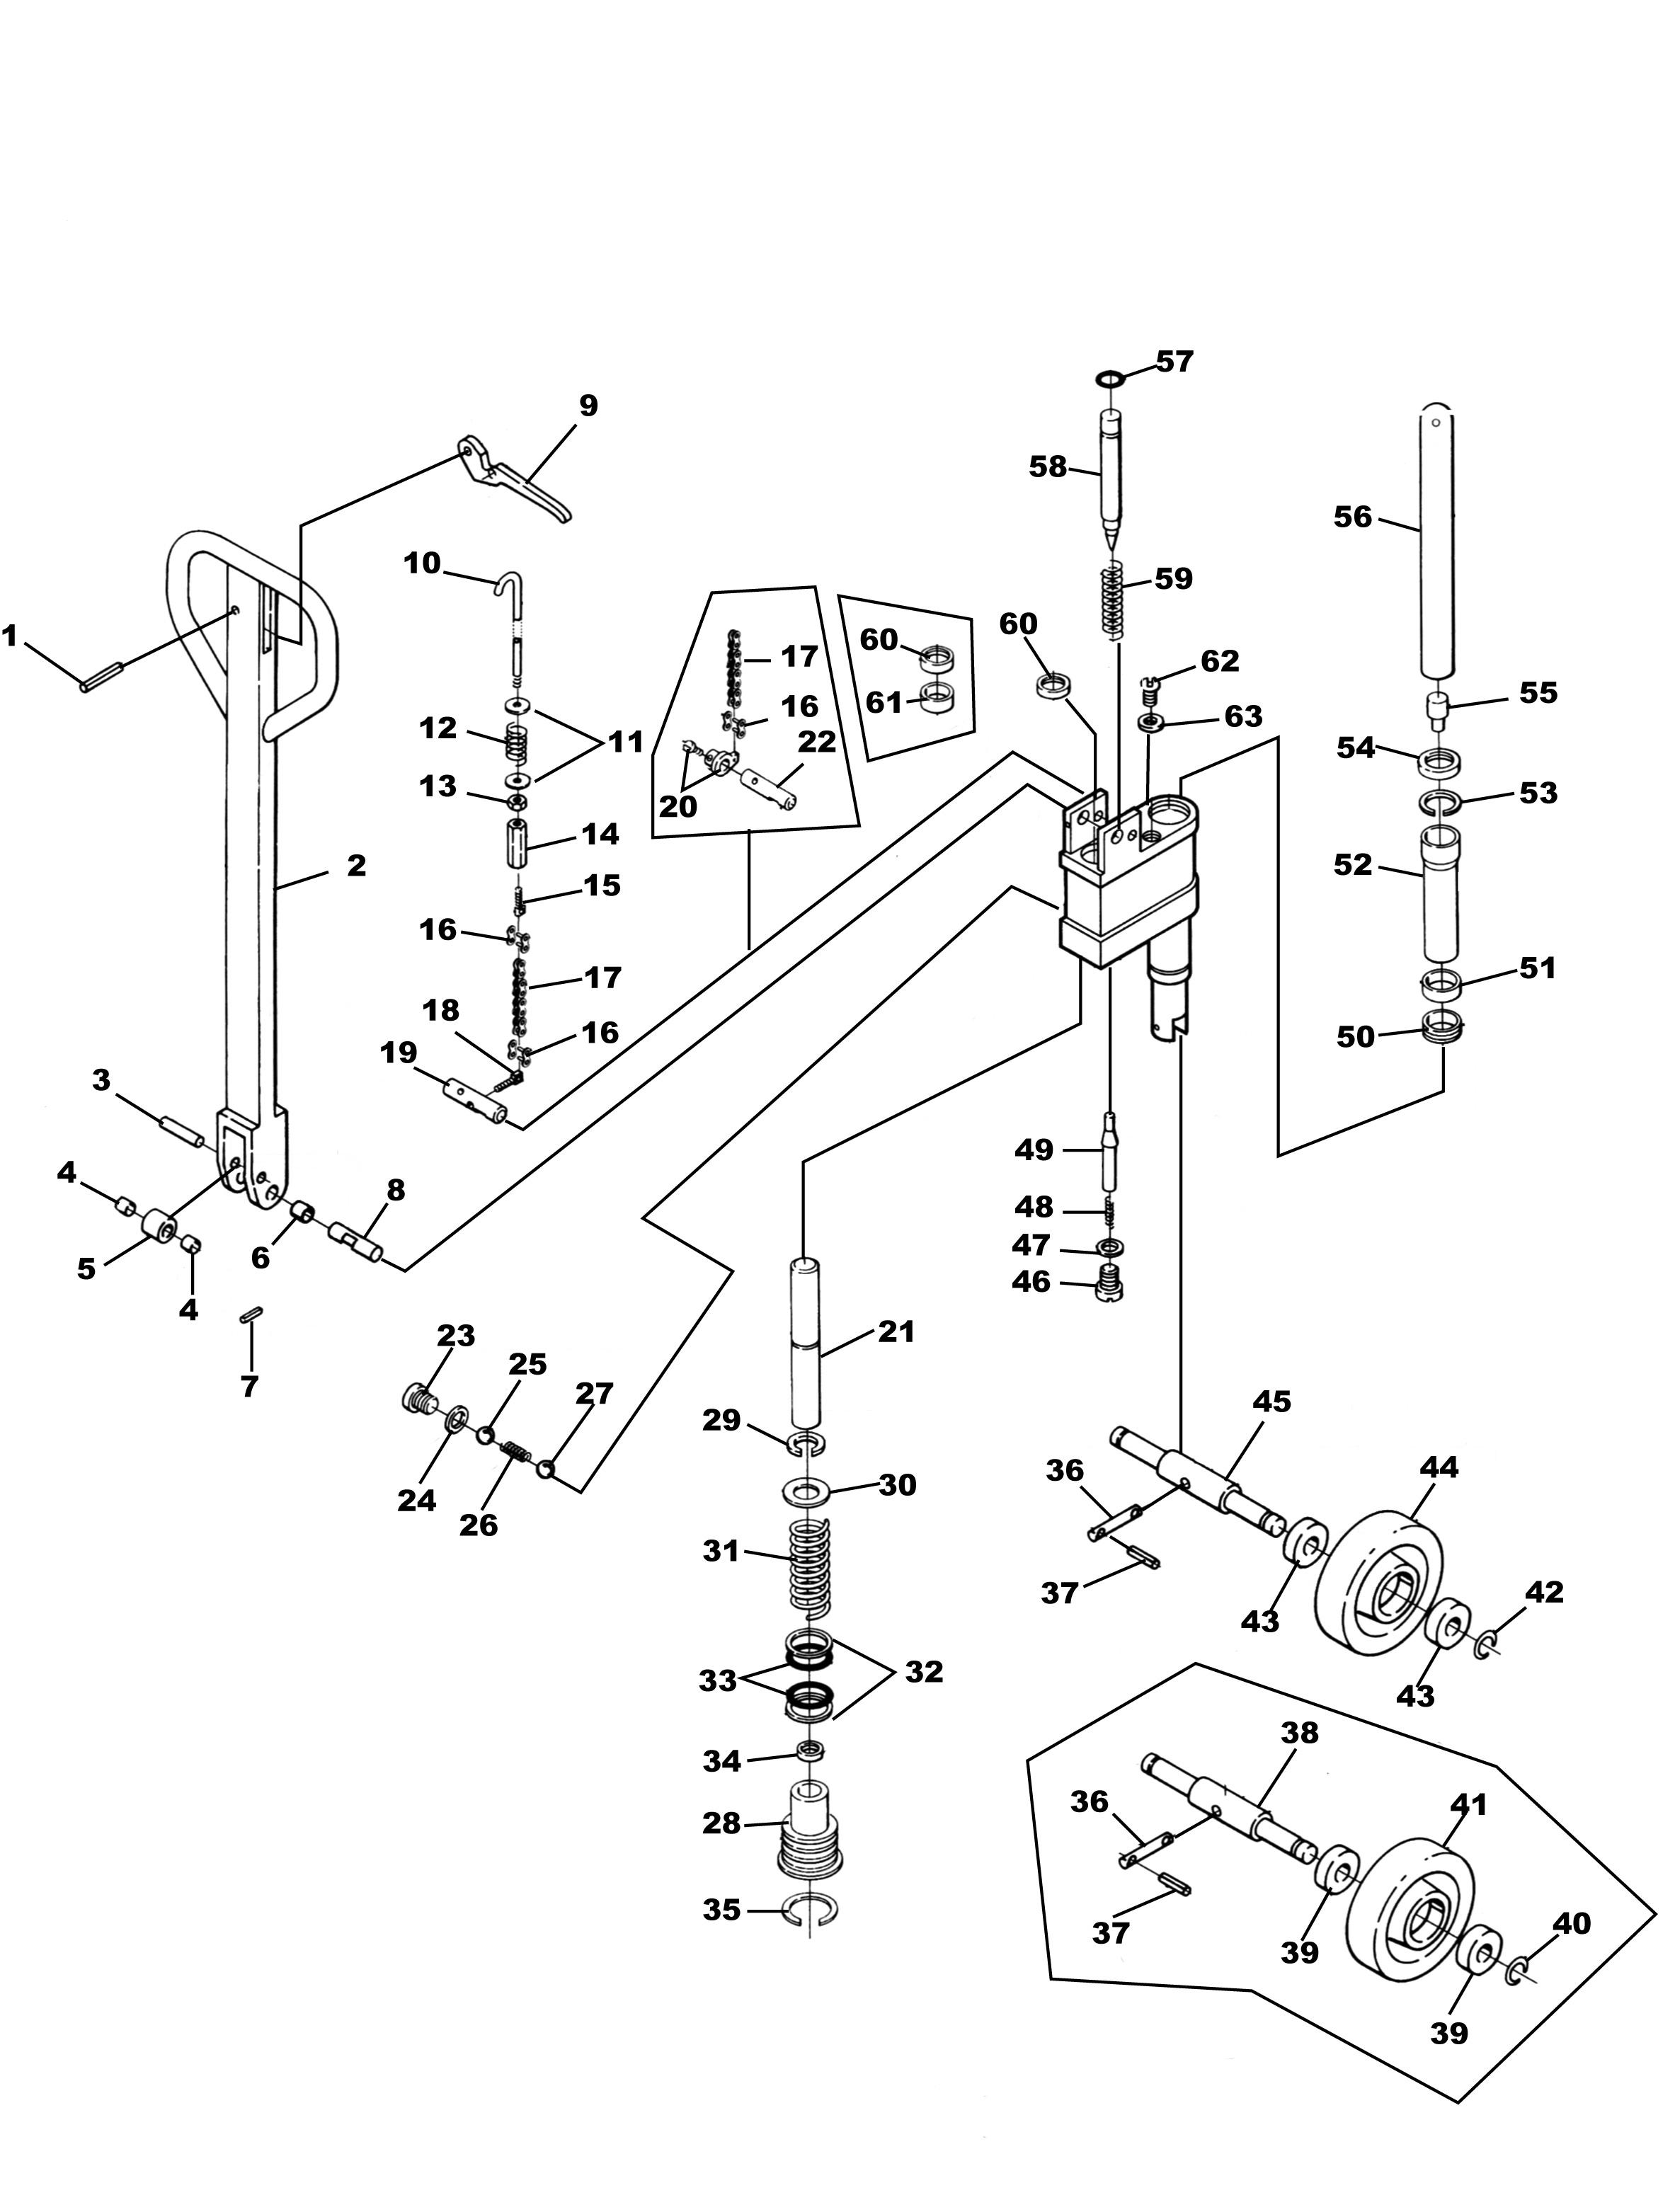 76 monte carlo wiring diagram